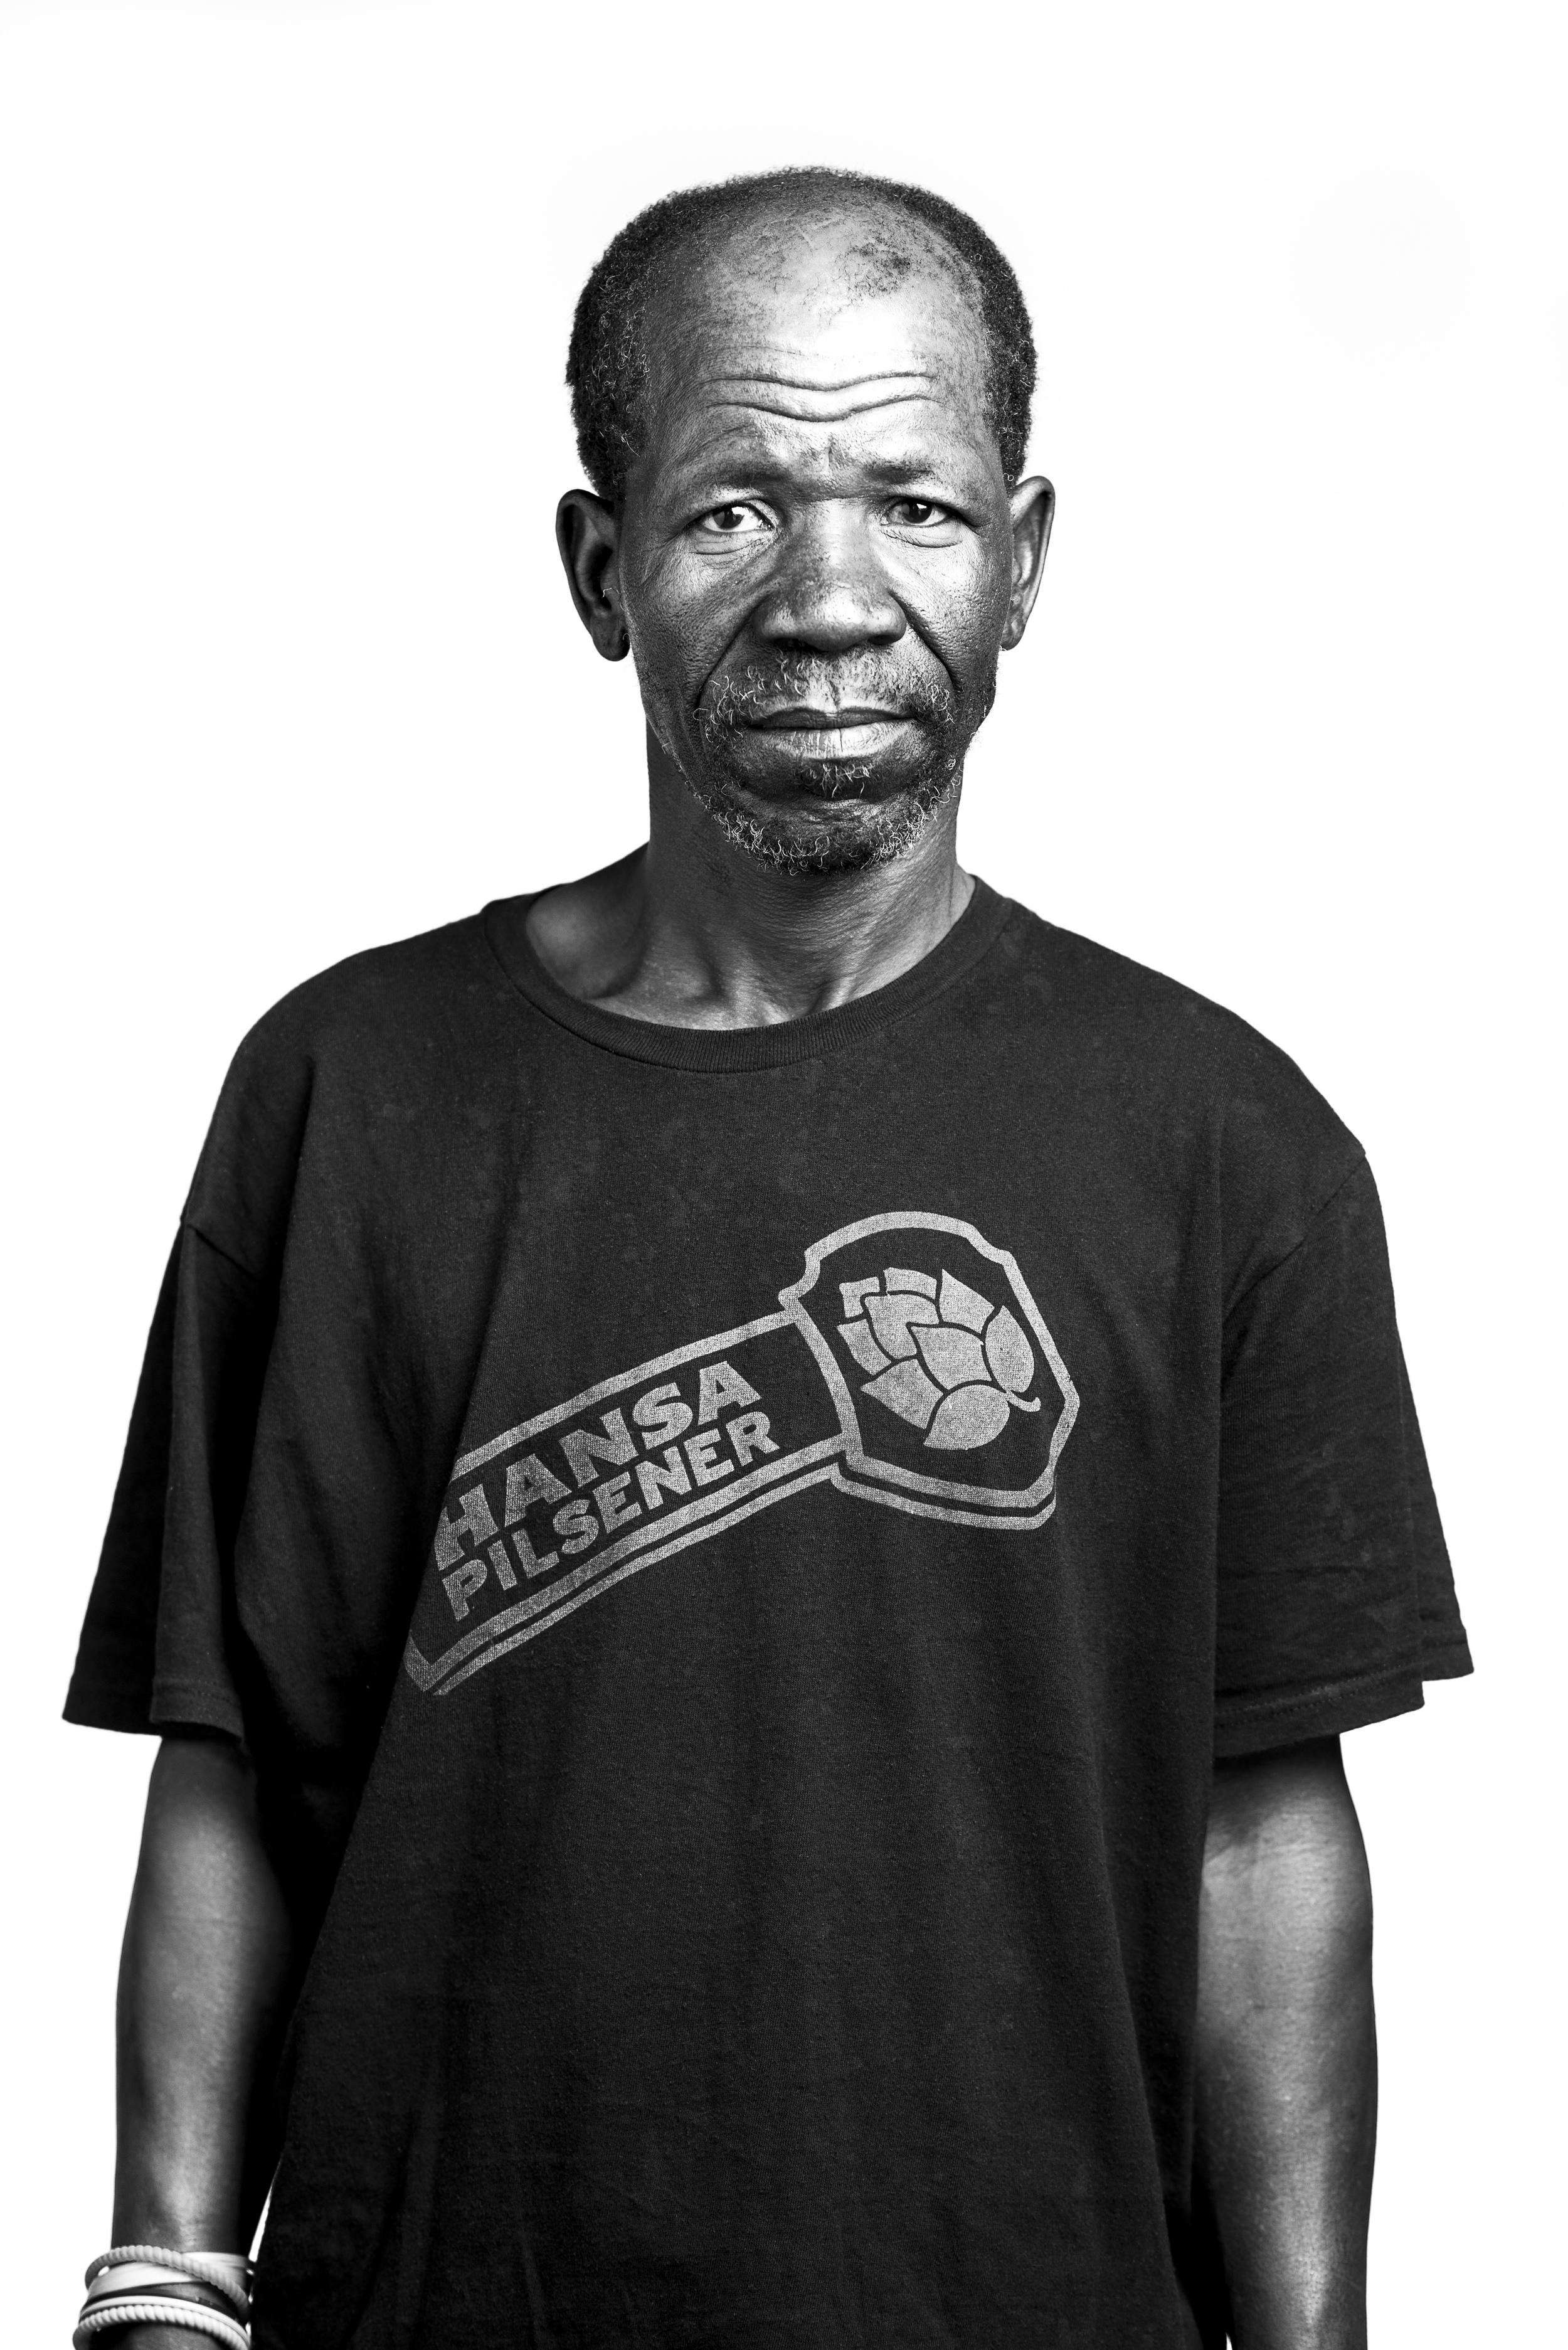 Mr Zimoshile Bozo